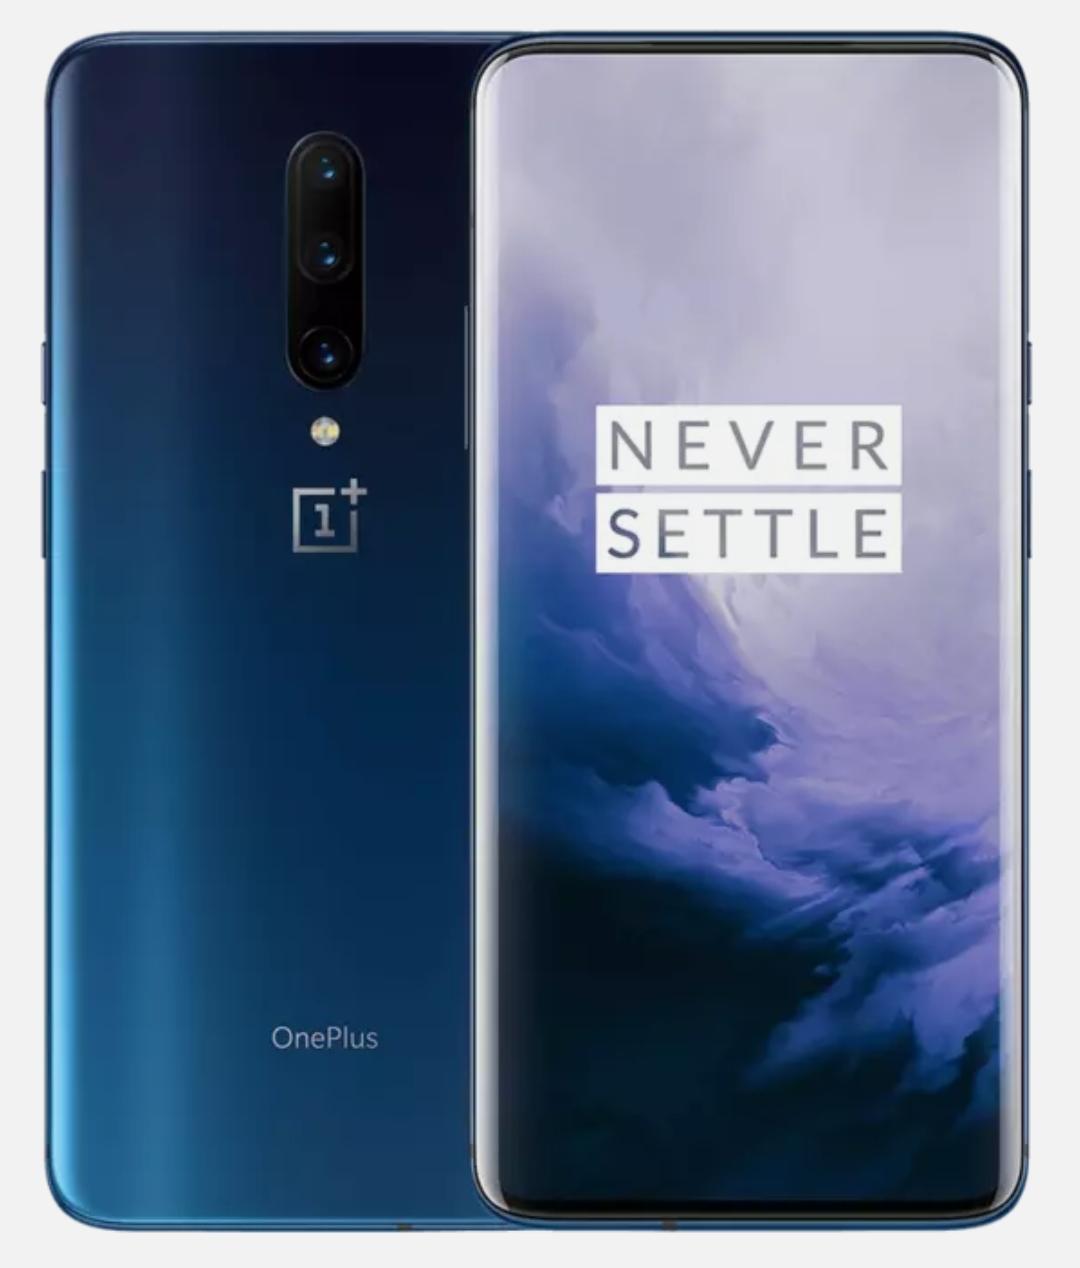 OnePlus 7 Pro 256GB Blue Unlocked Smartphone - Refurbished Grade B Condition - £183.19 Nectar Code / £194.64 non-Nectar @ XS Items / Ebay